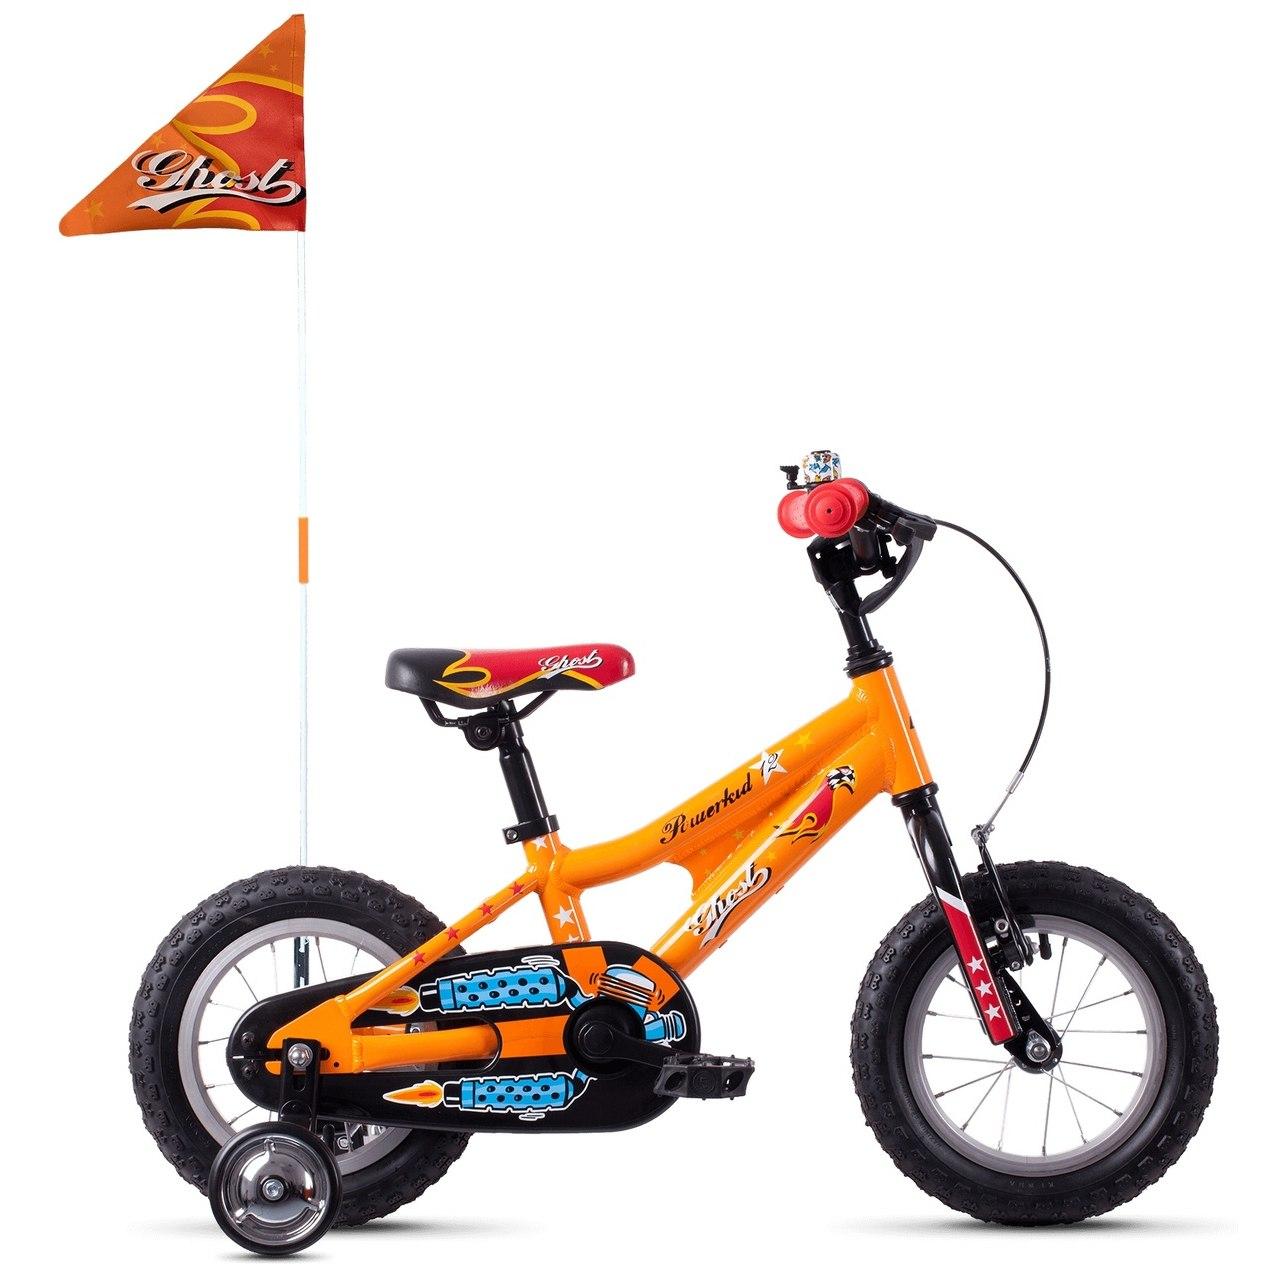 "Ghost POWERKID AL 12 K - 12"" Kids Bike - 2021 - juice orange / riot red / riot blue"